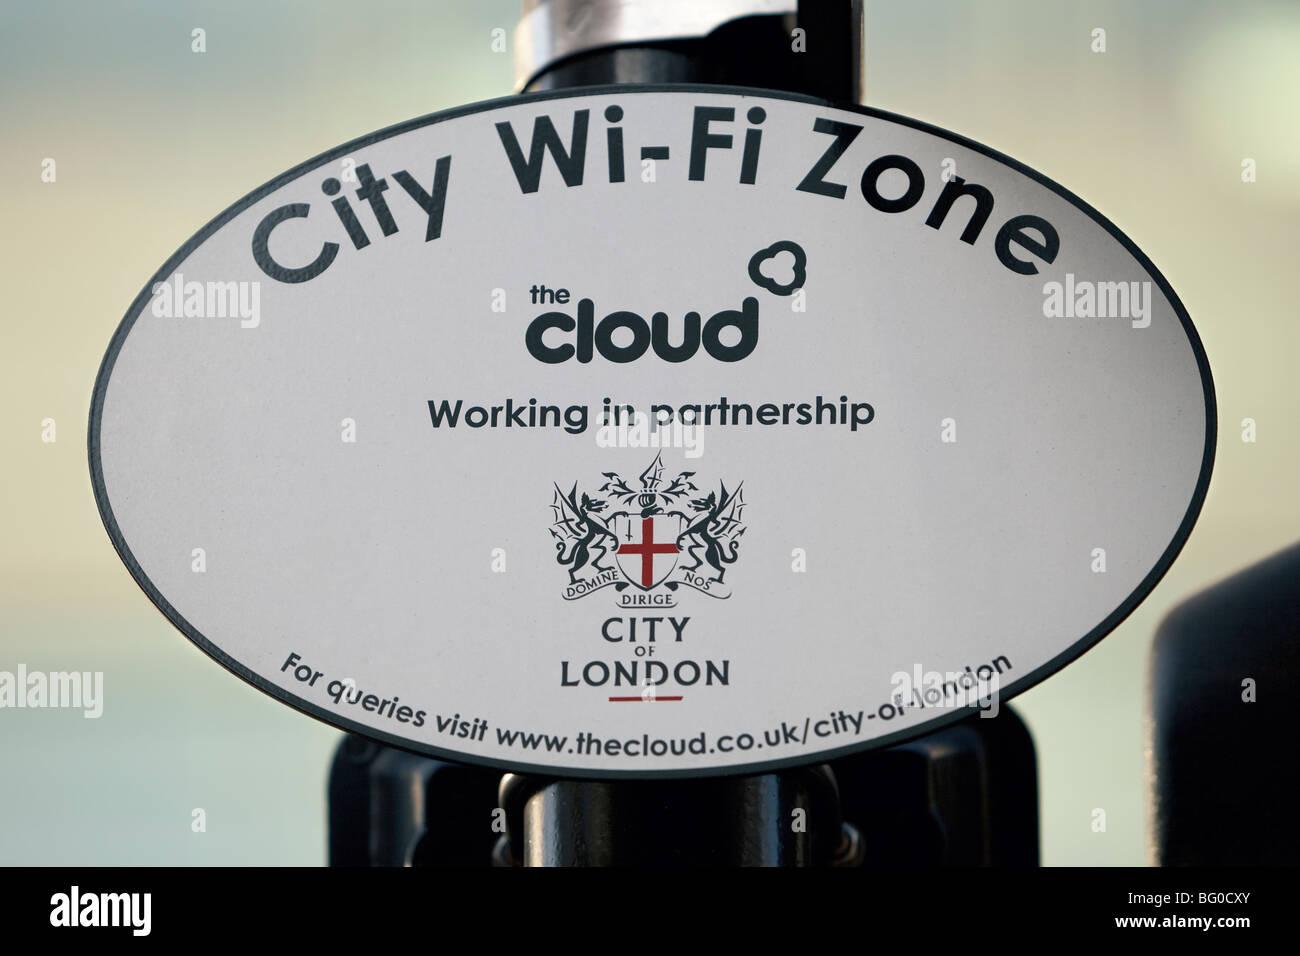 The cloud wi fi zone sign, London, UK - Stock Image